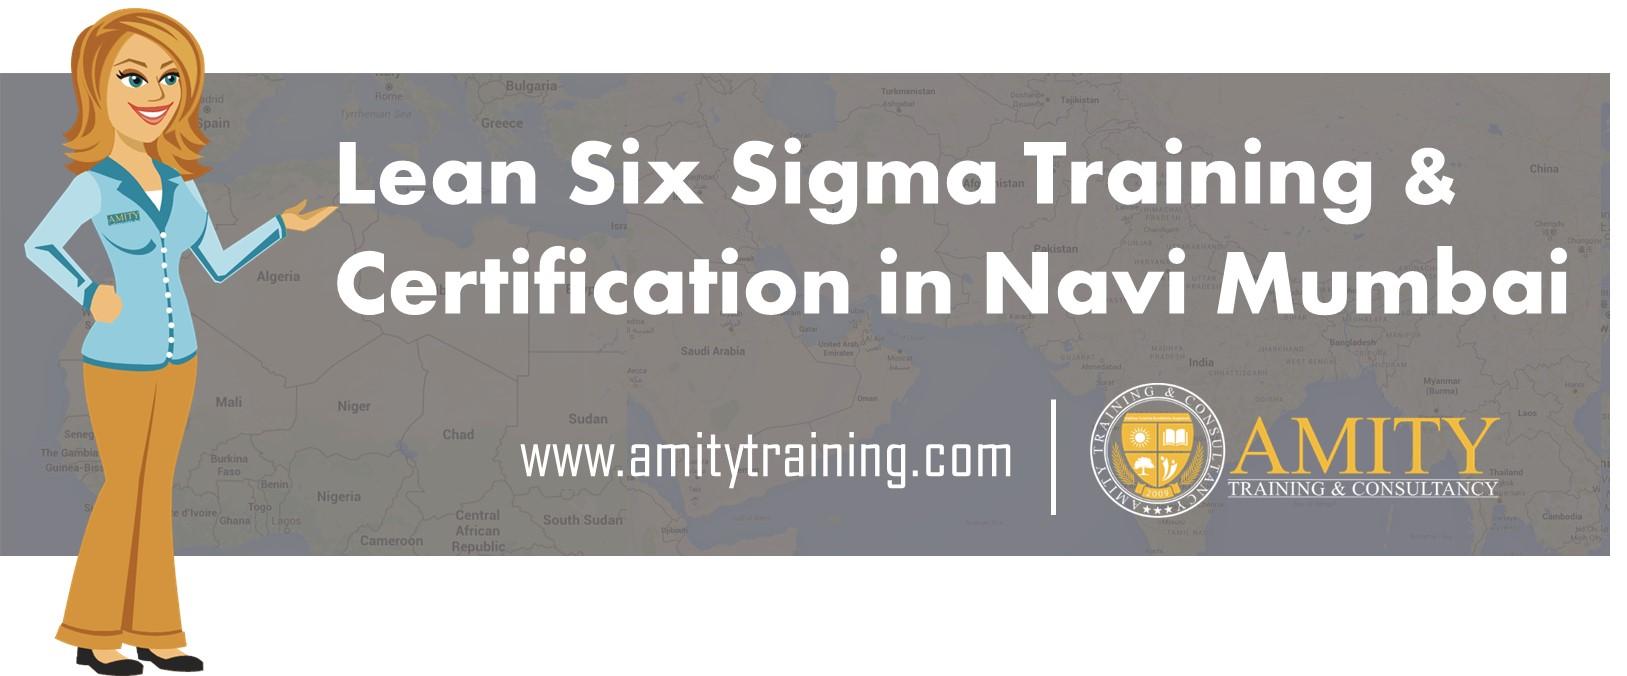 Lean Six Sigma Training In Navi Mumbai Amity Training And Consultancy